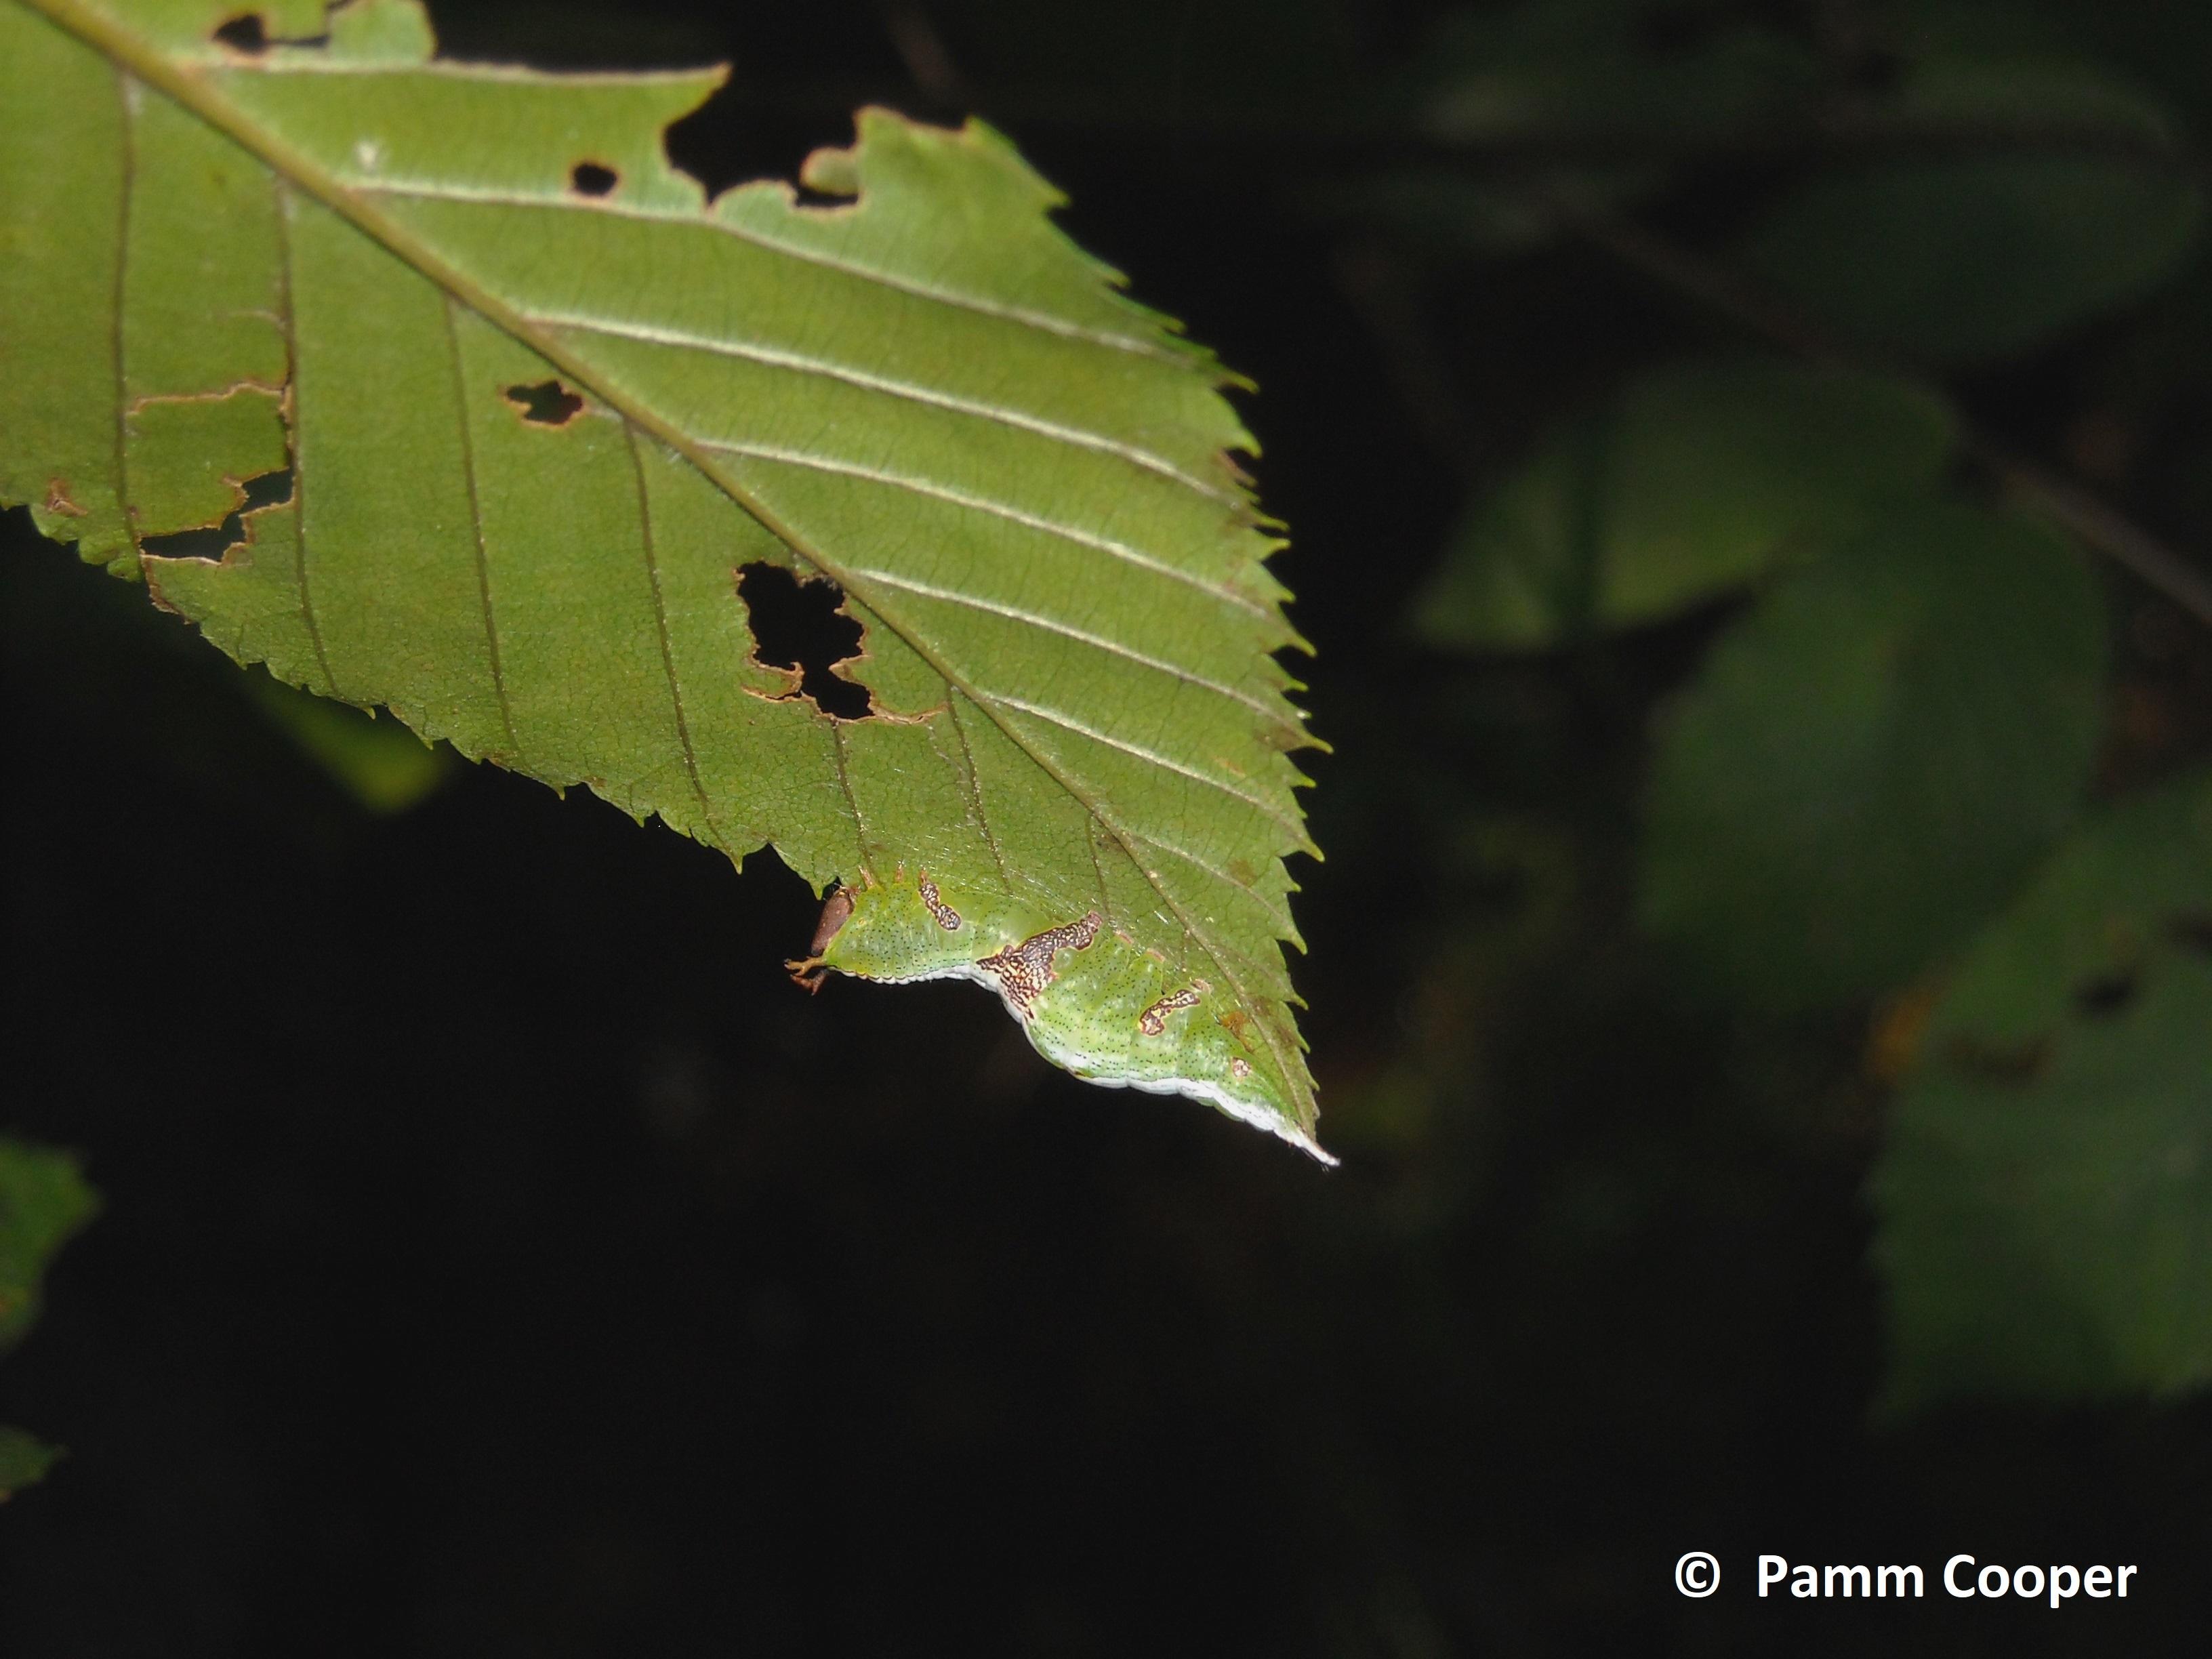 wavy- lined heteocampa 2 on leaf edge